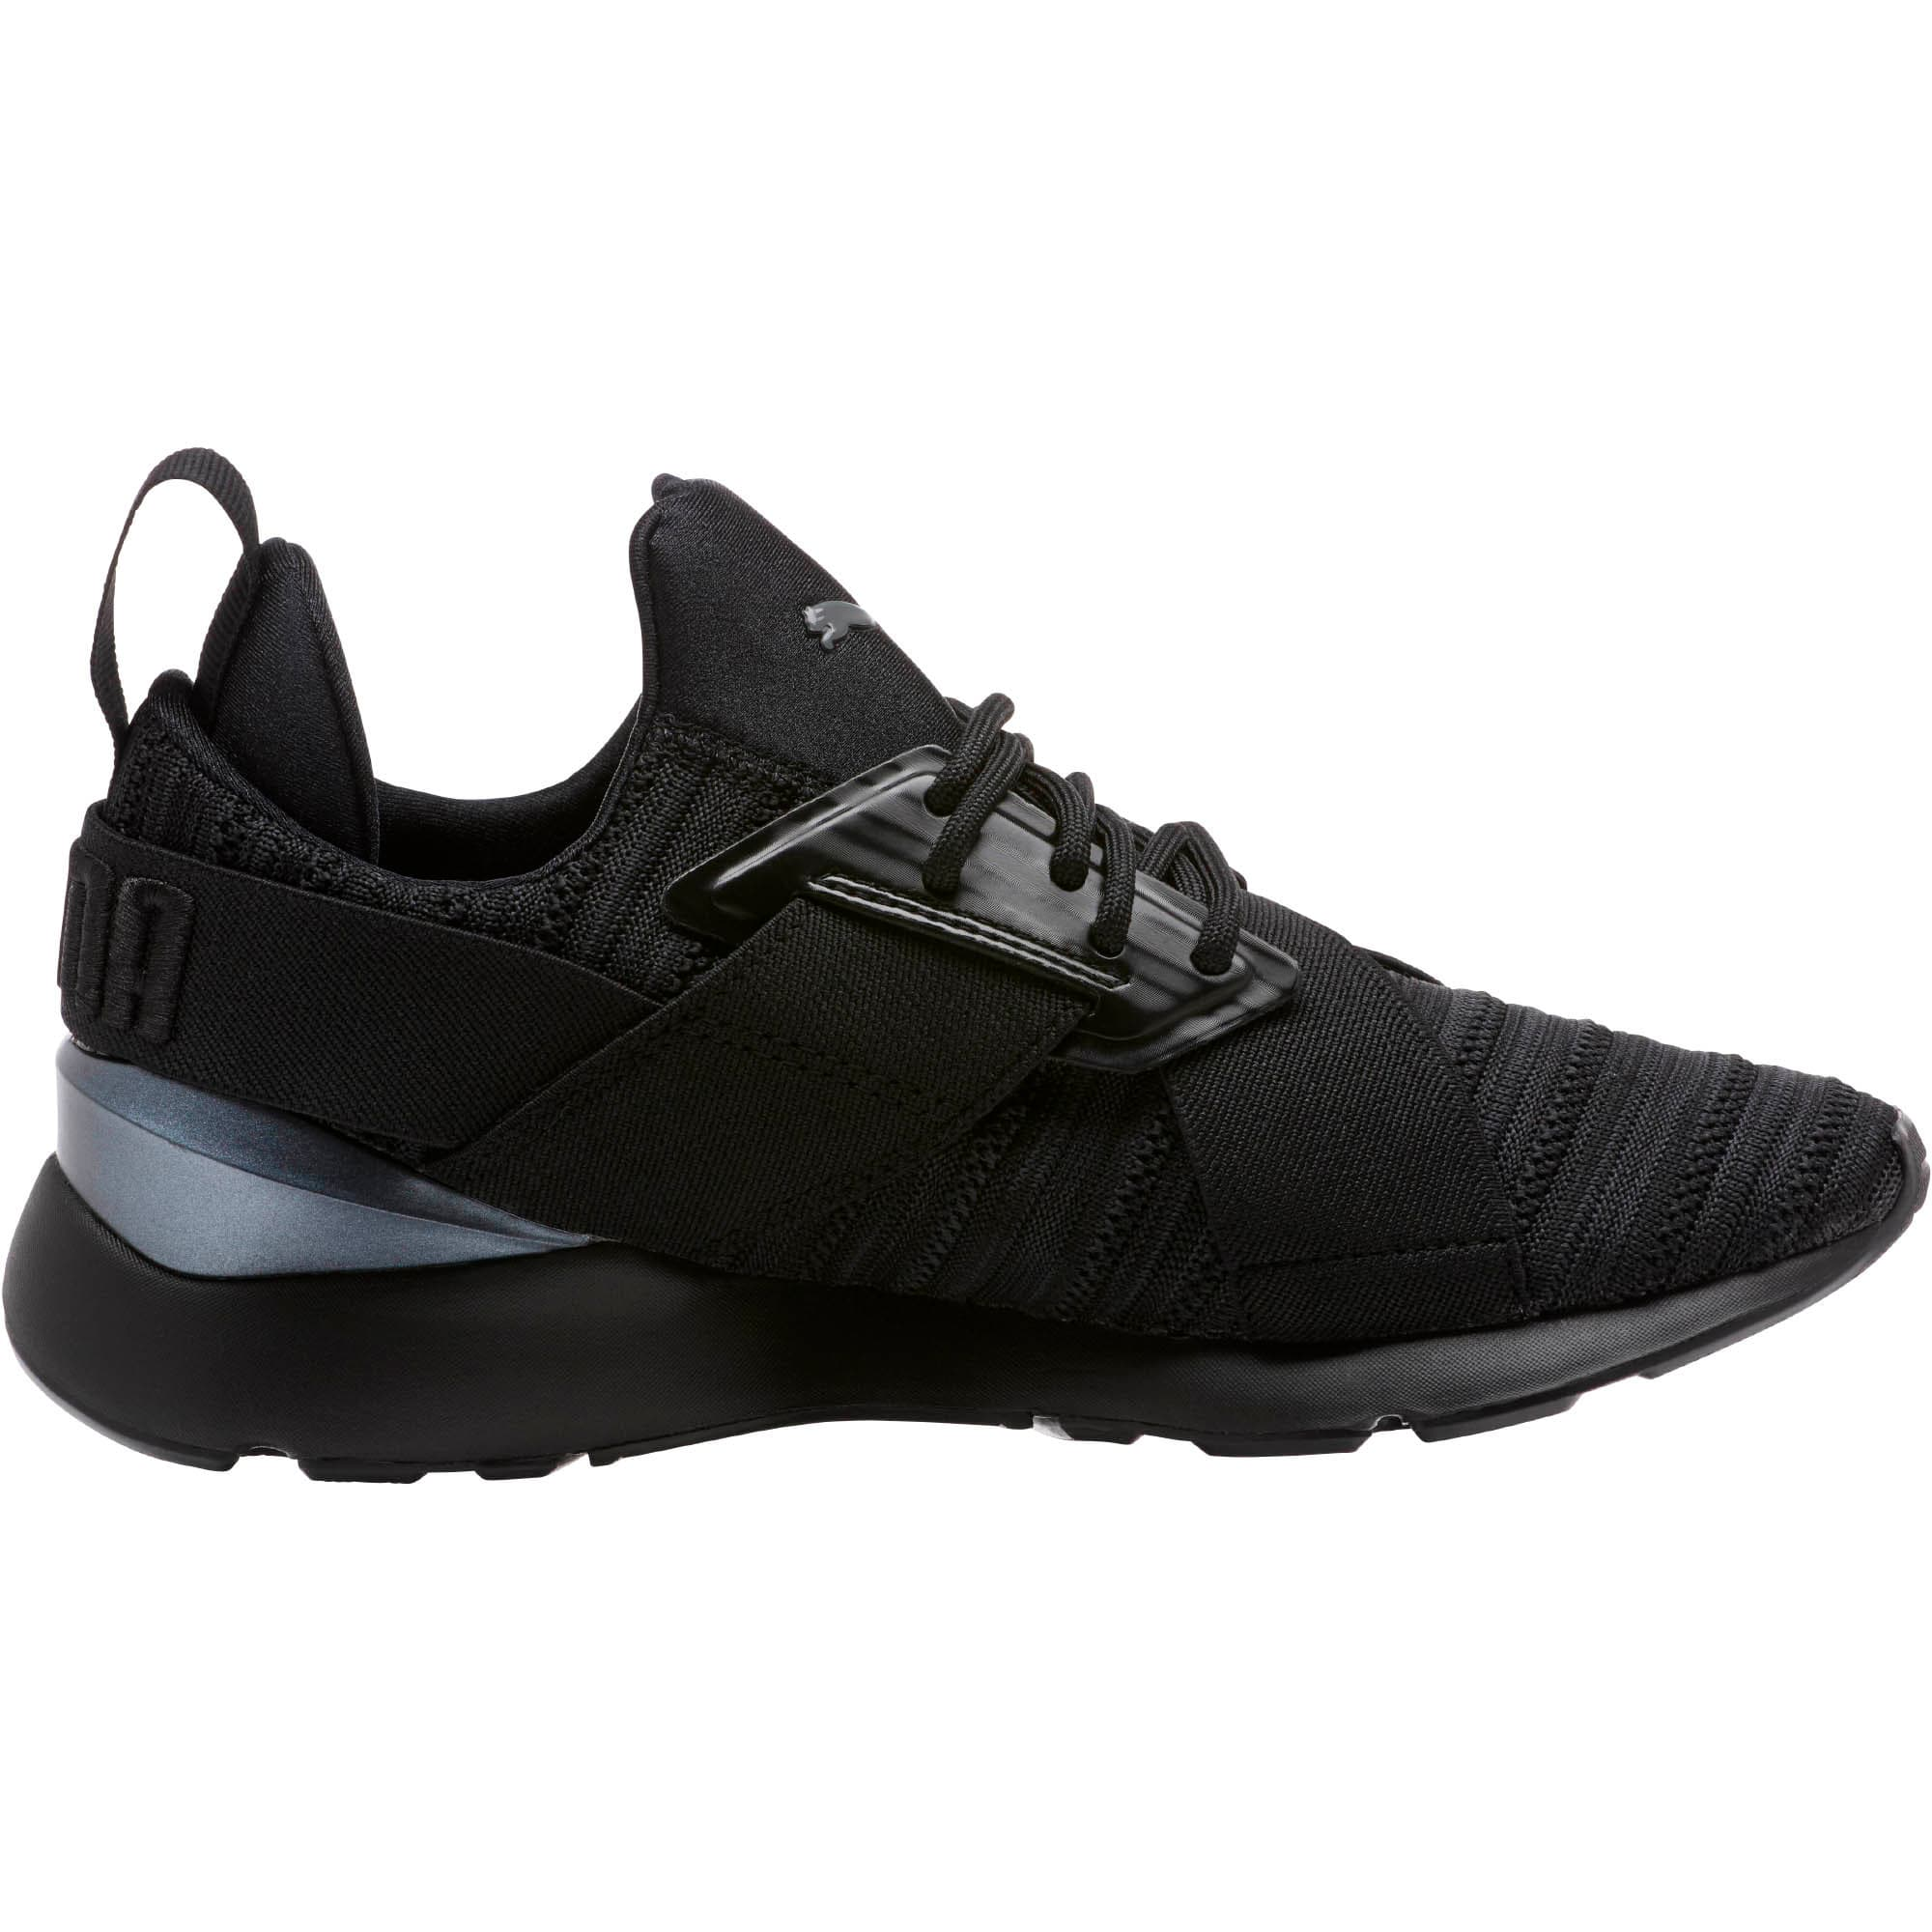 Thumbnail 3 of Muse Knit Women's Sneakers, Iron Gate-Puma Black, medium